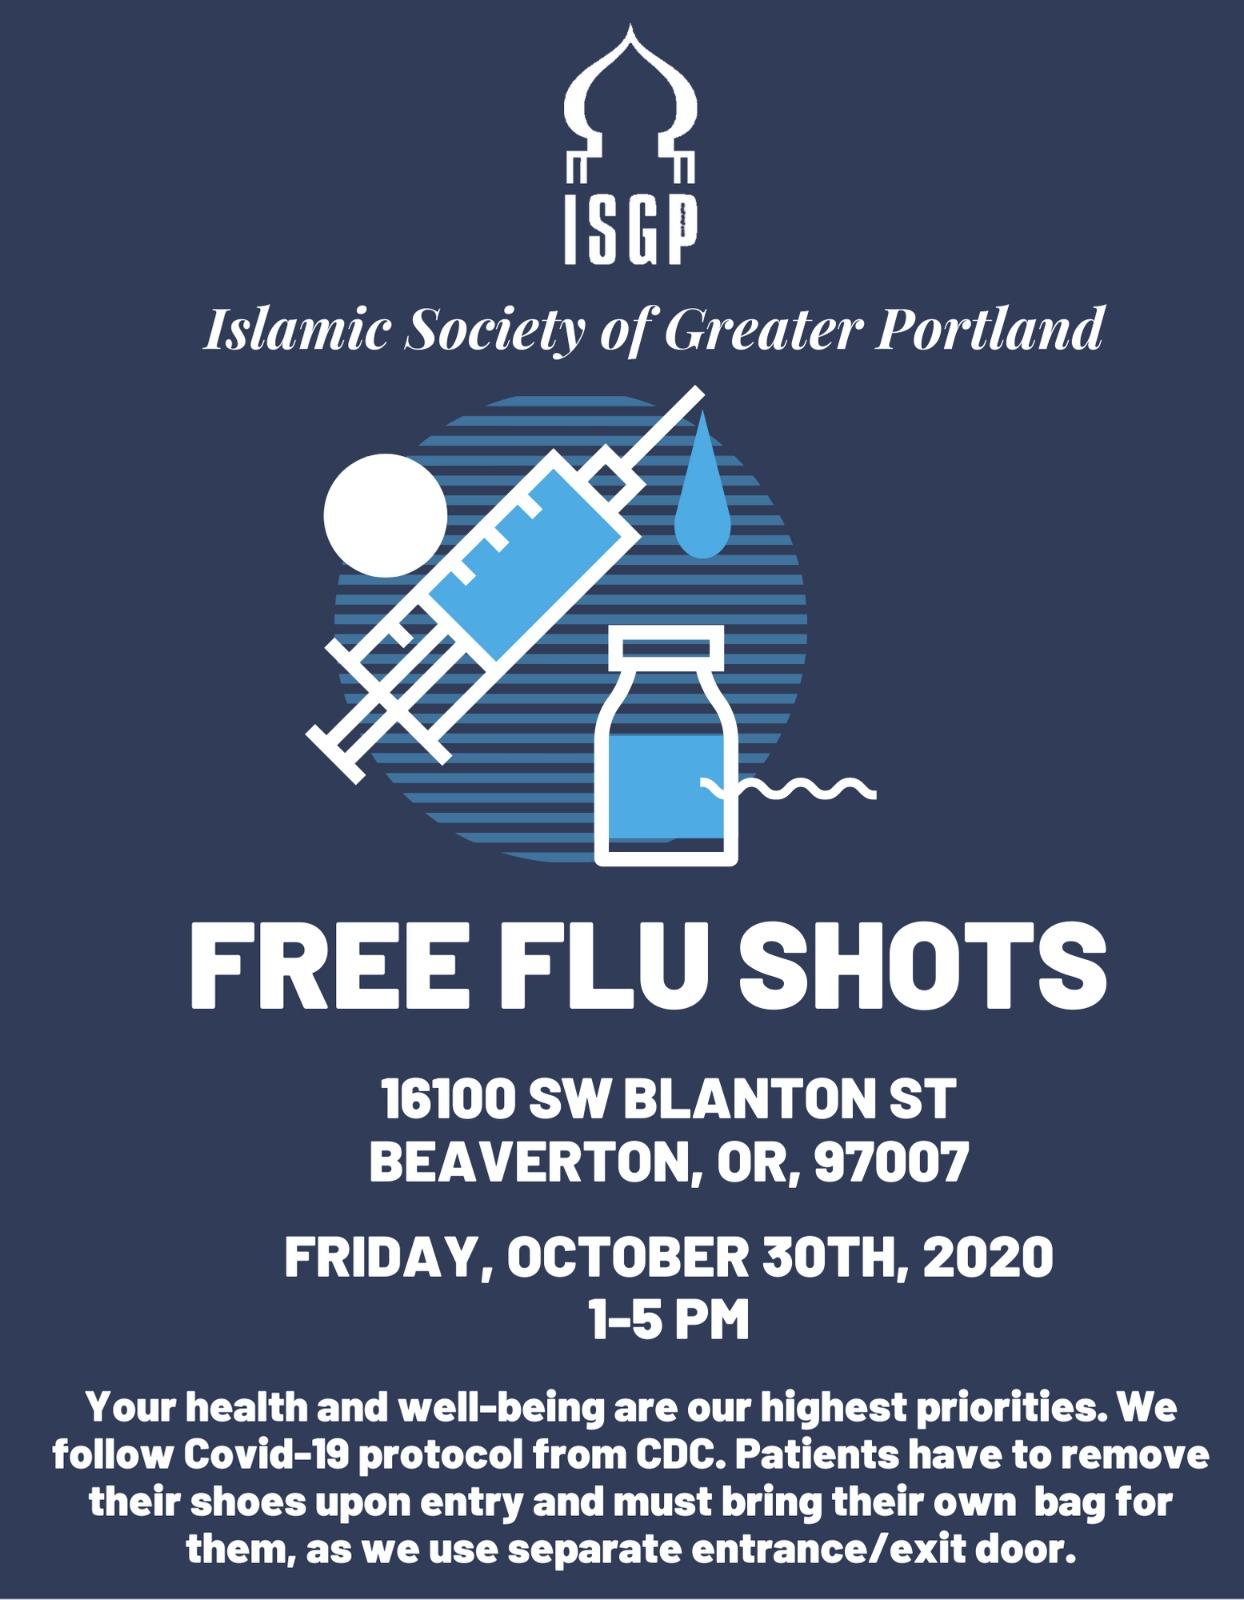 Free Flu Shots Friday October 30th 2020 1-5 PM